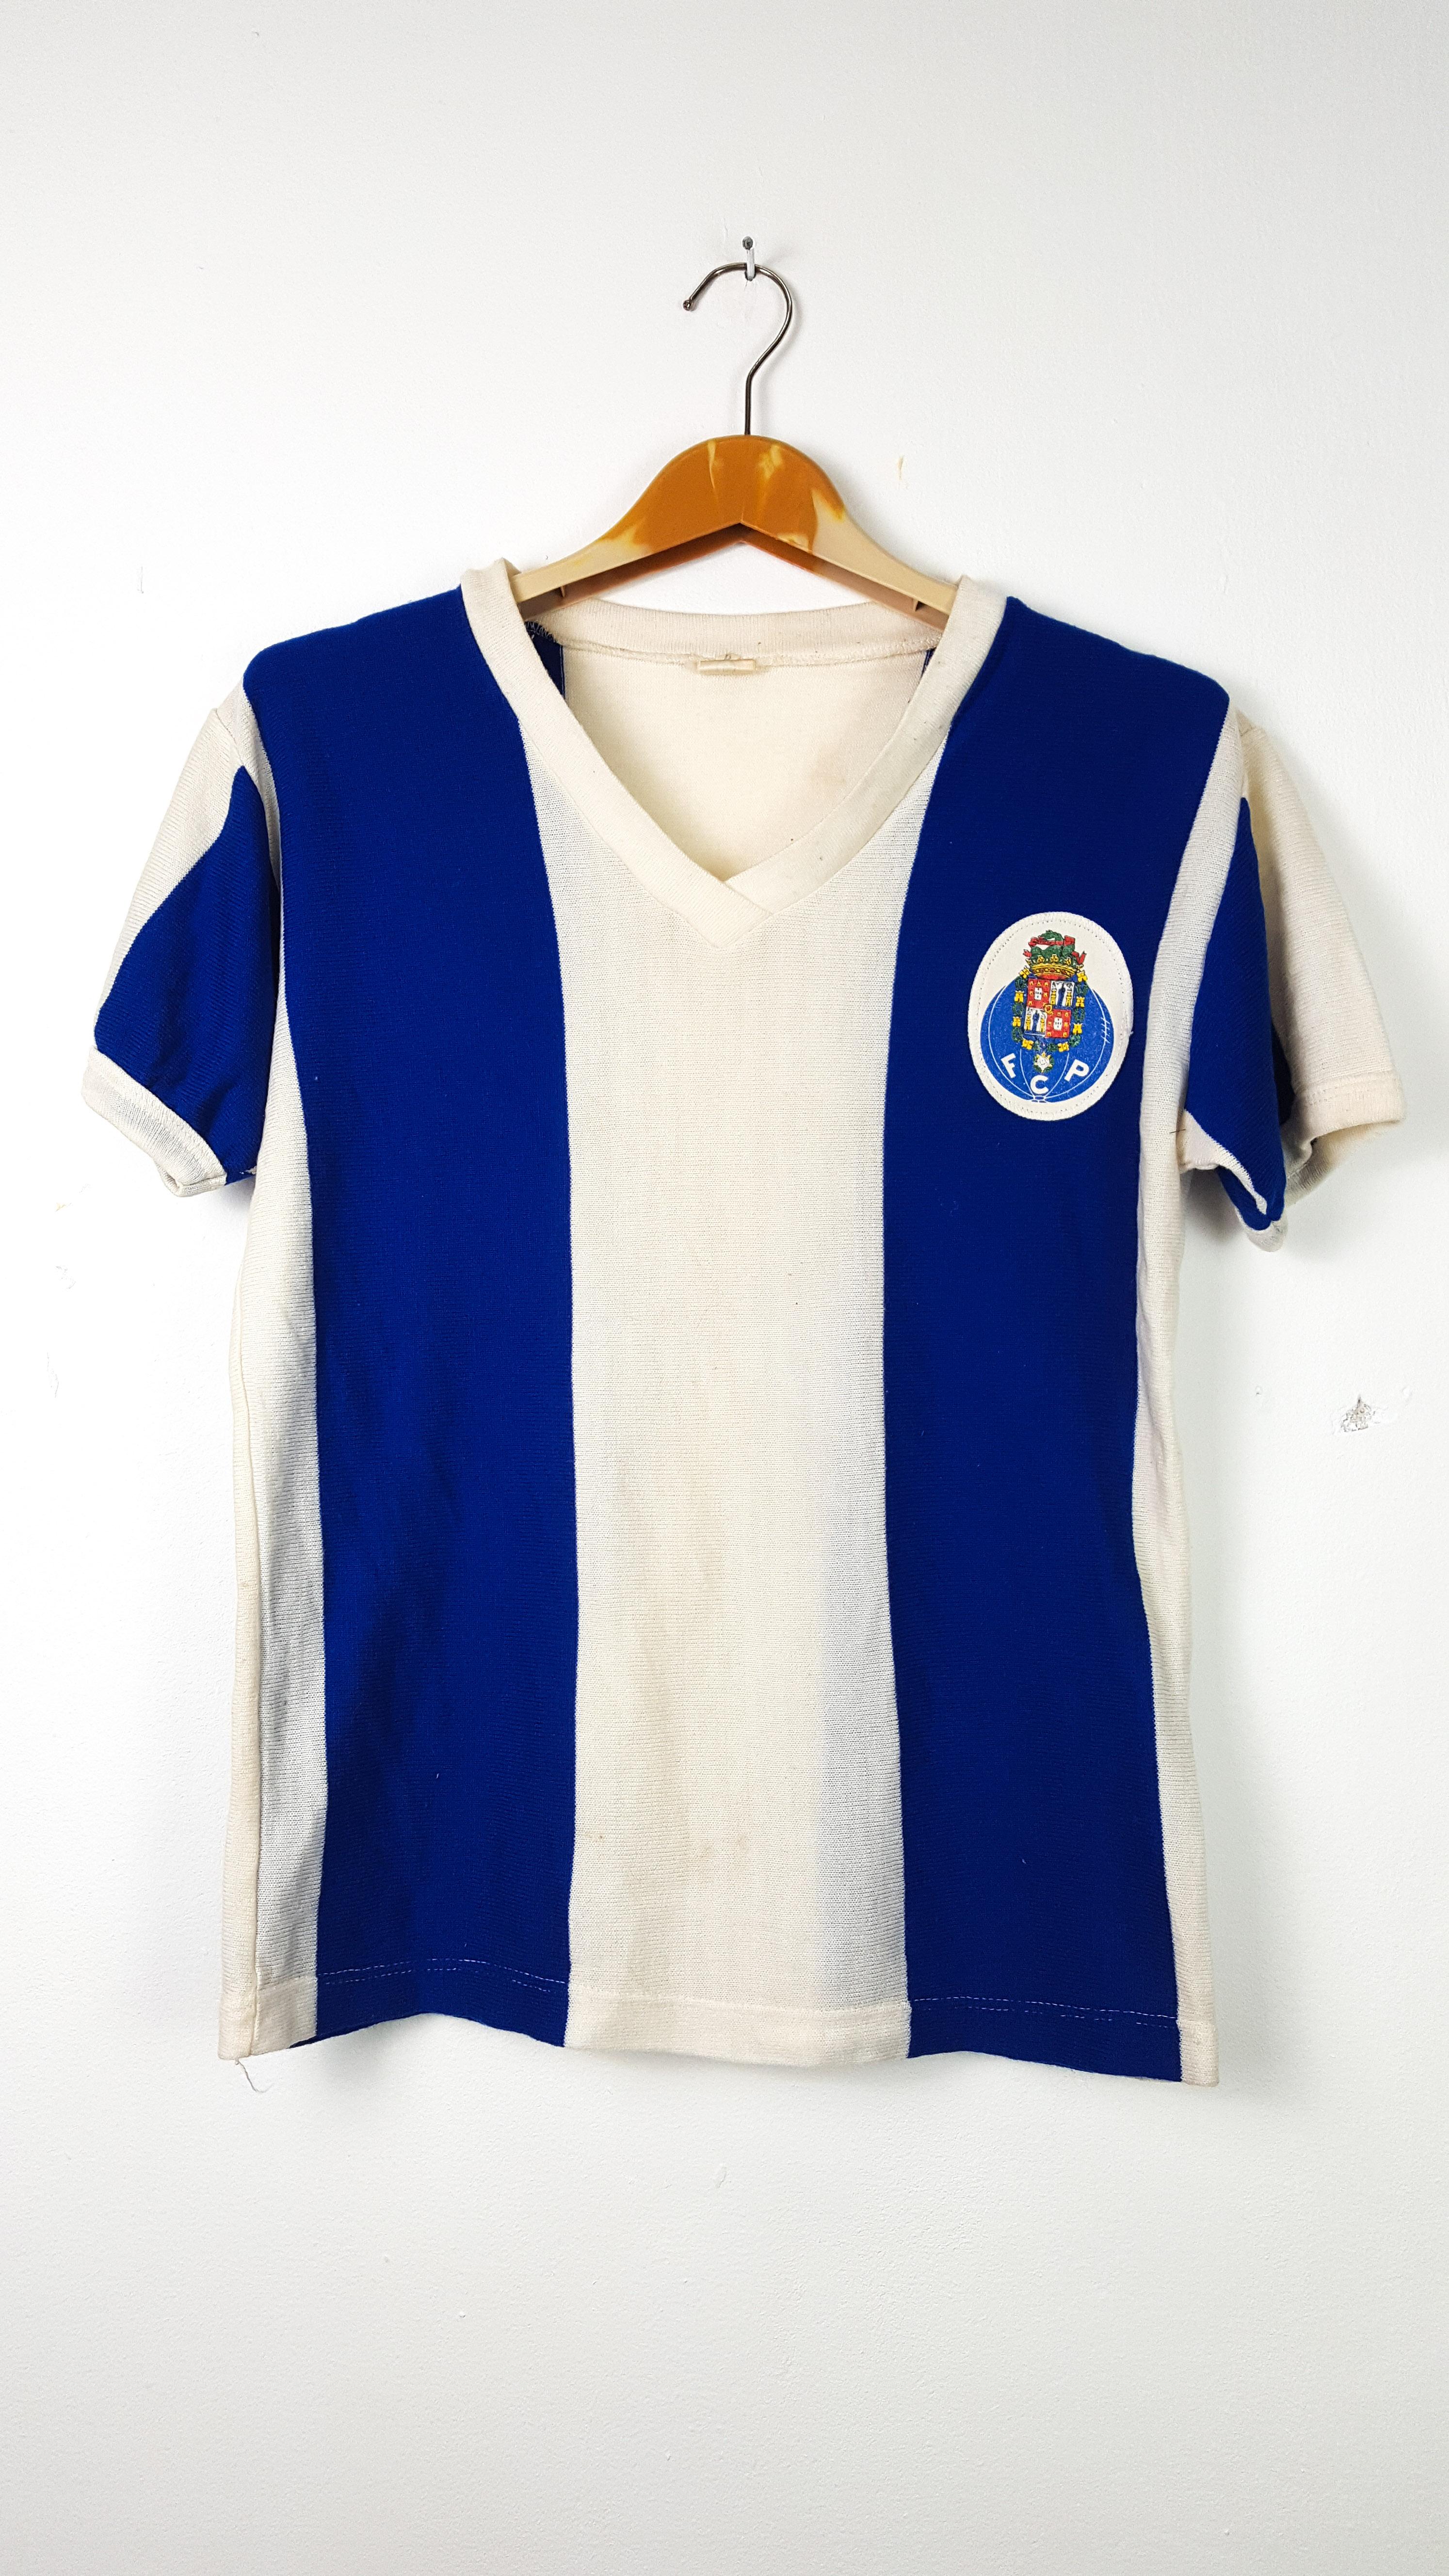 c231c83ae Vintage Vintage 70 s FC PORTO Football Soccer Camisa De Futebol Jersey  Shirt Size s - Jerseys for Sale - Grailed